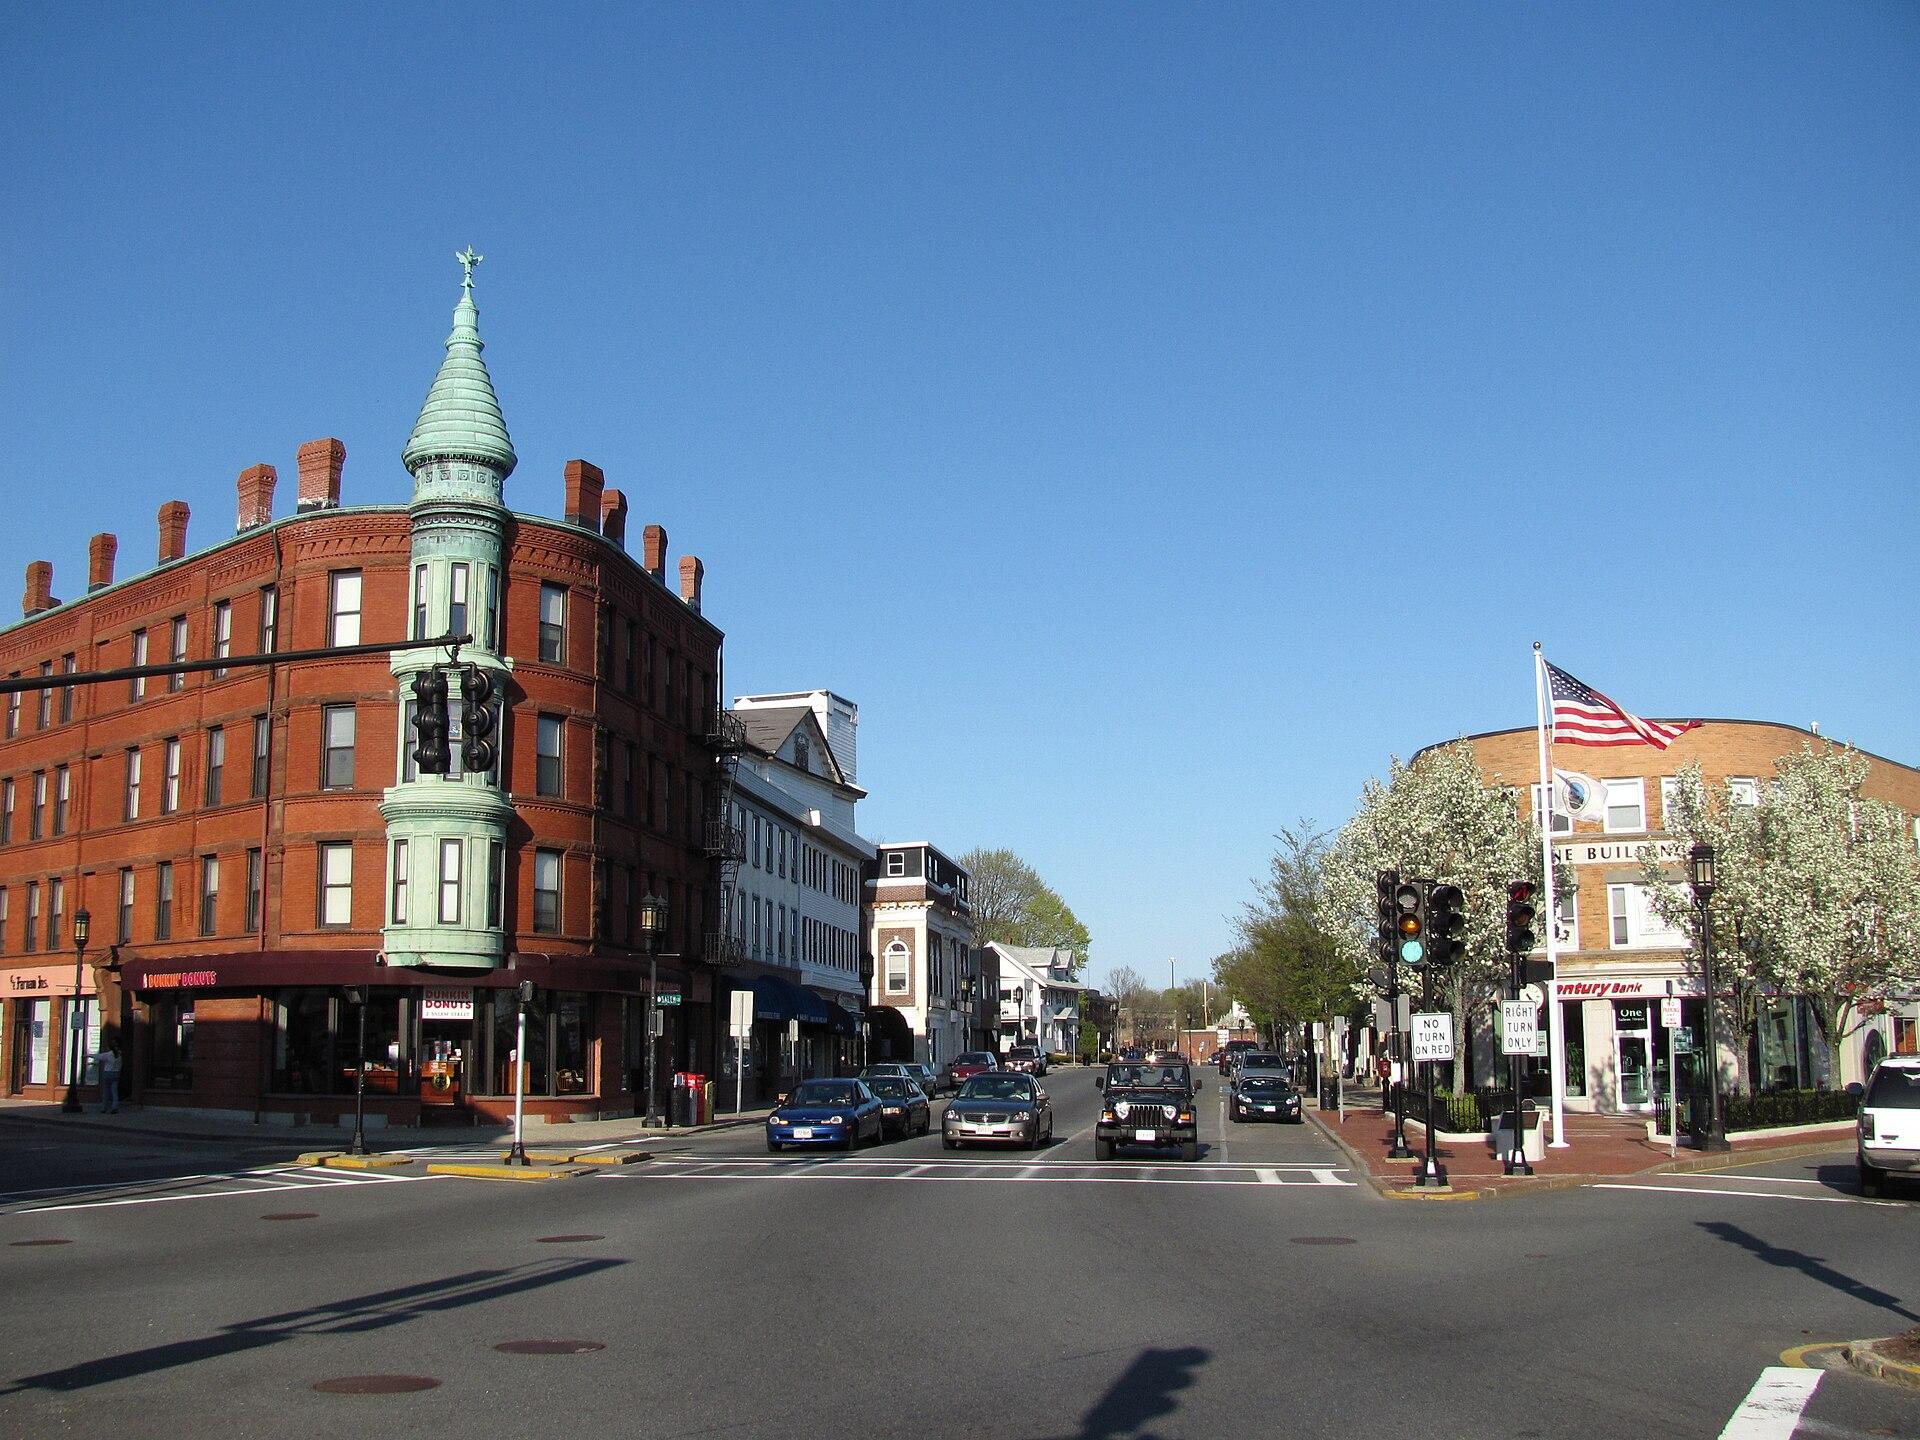 Area Of Rhode Island In Square Kilometers